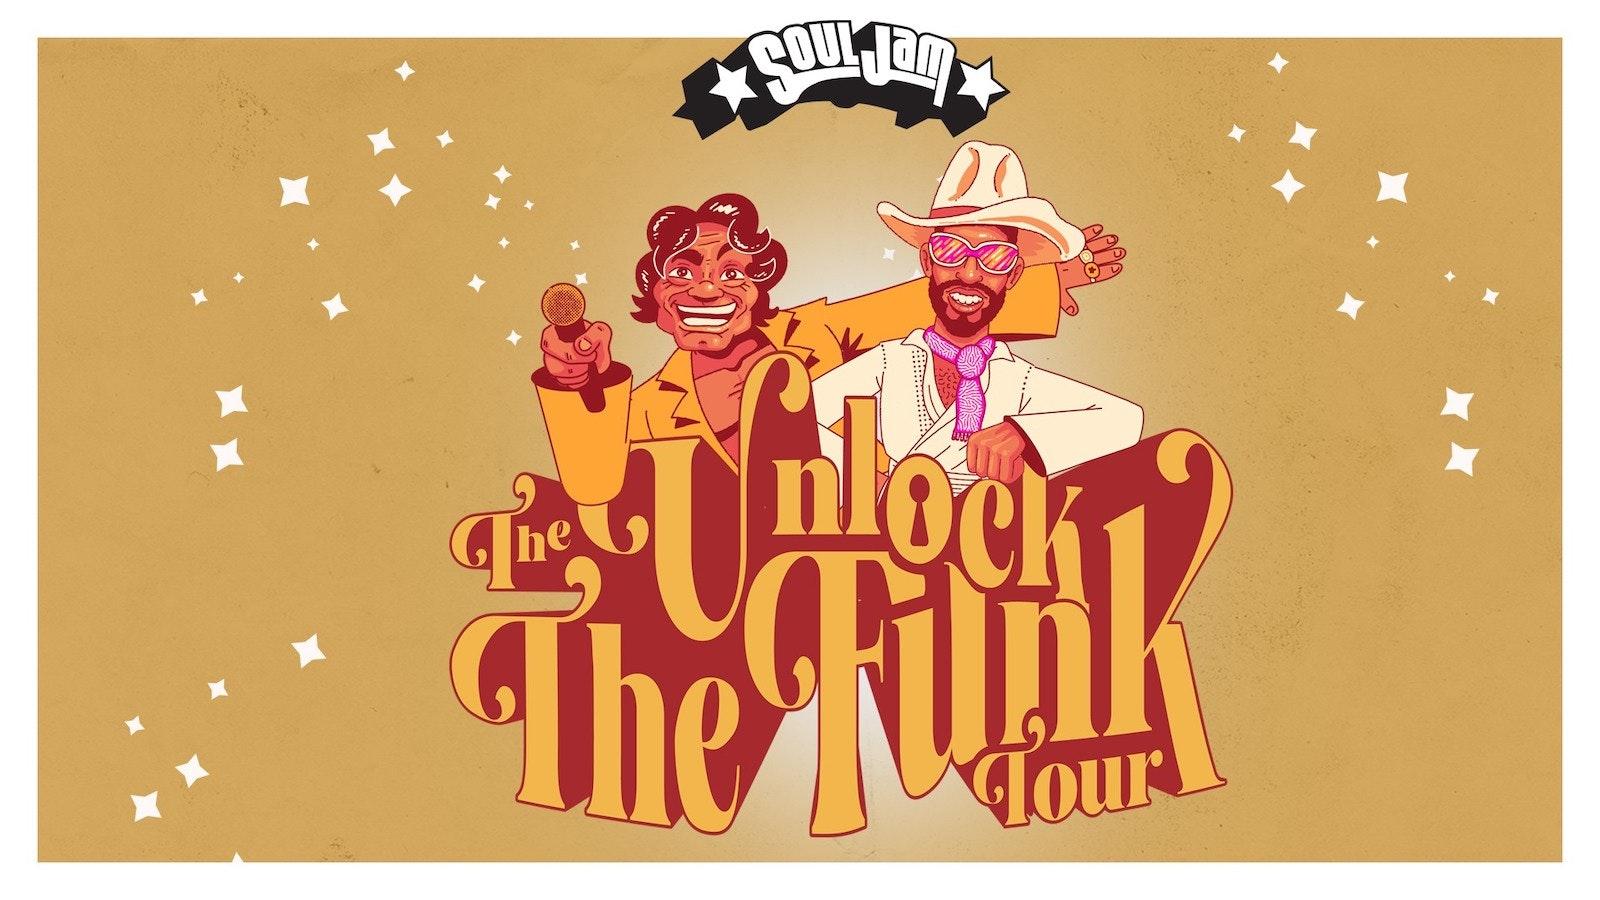 SoulJam | Unlock the Funk Tour | Manchester | Gorilla